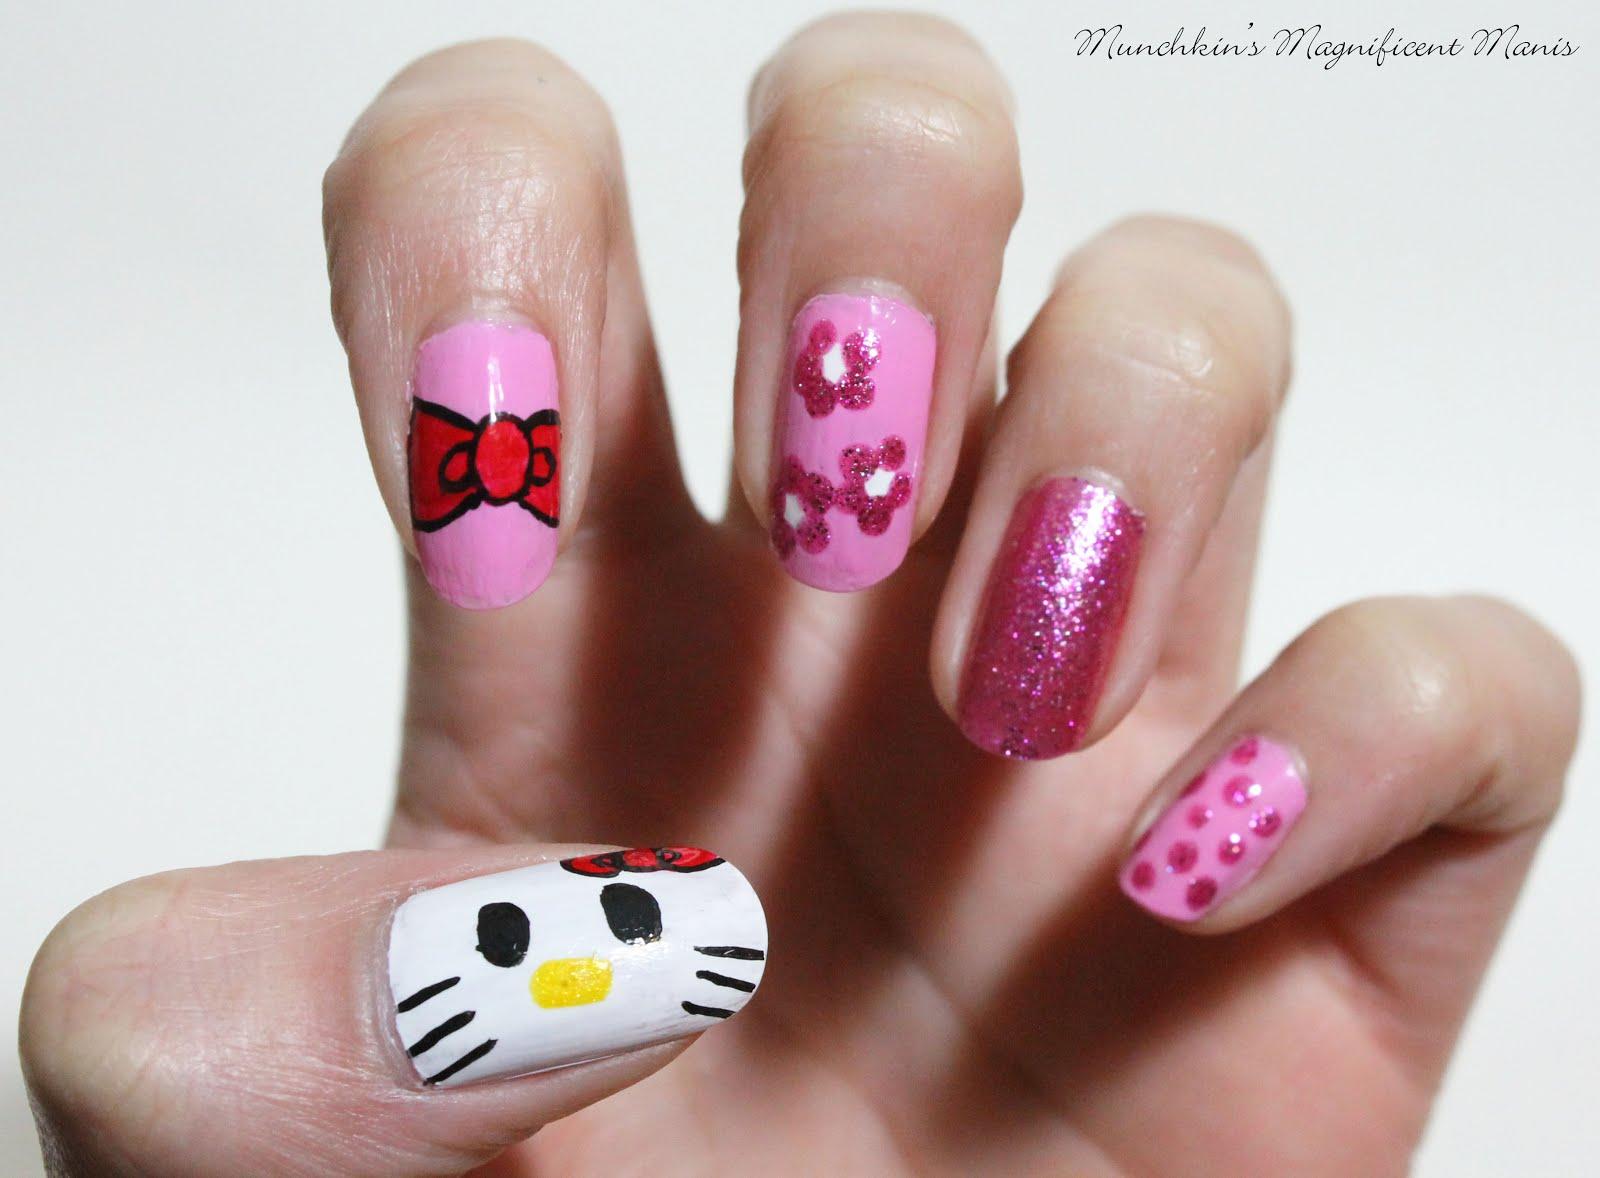 Munchkins magnificent manis hello hello kitty nail art tutorial hello kitty design prinsesfo Choice Image